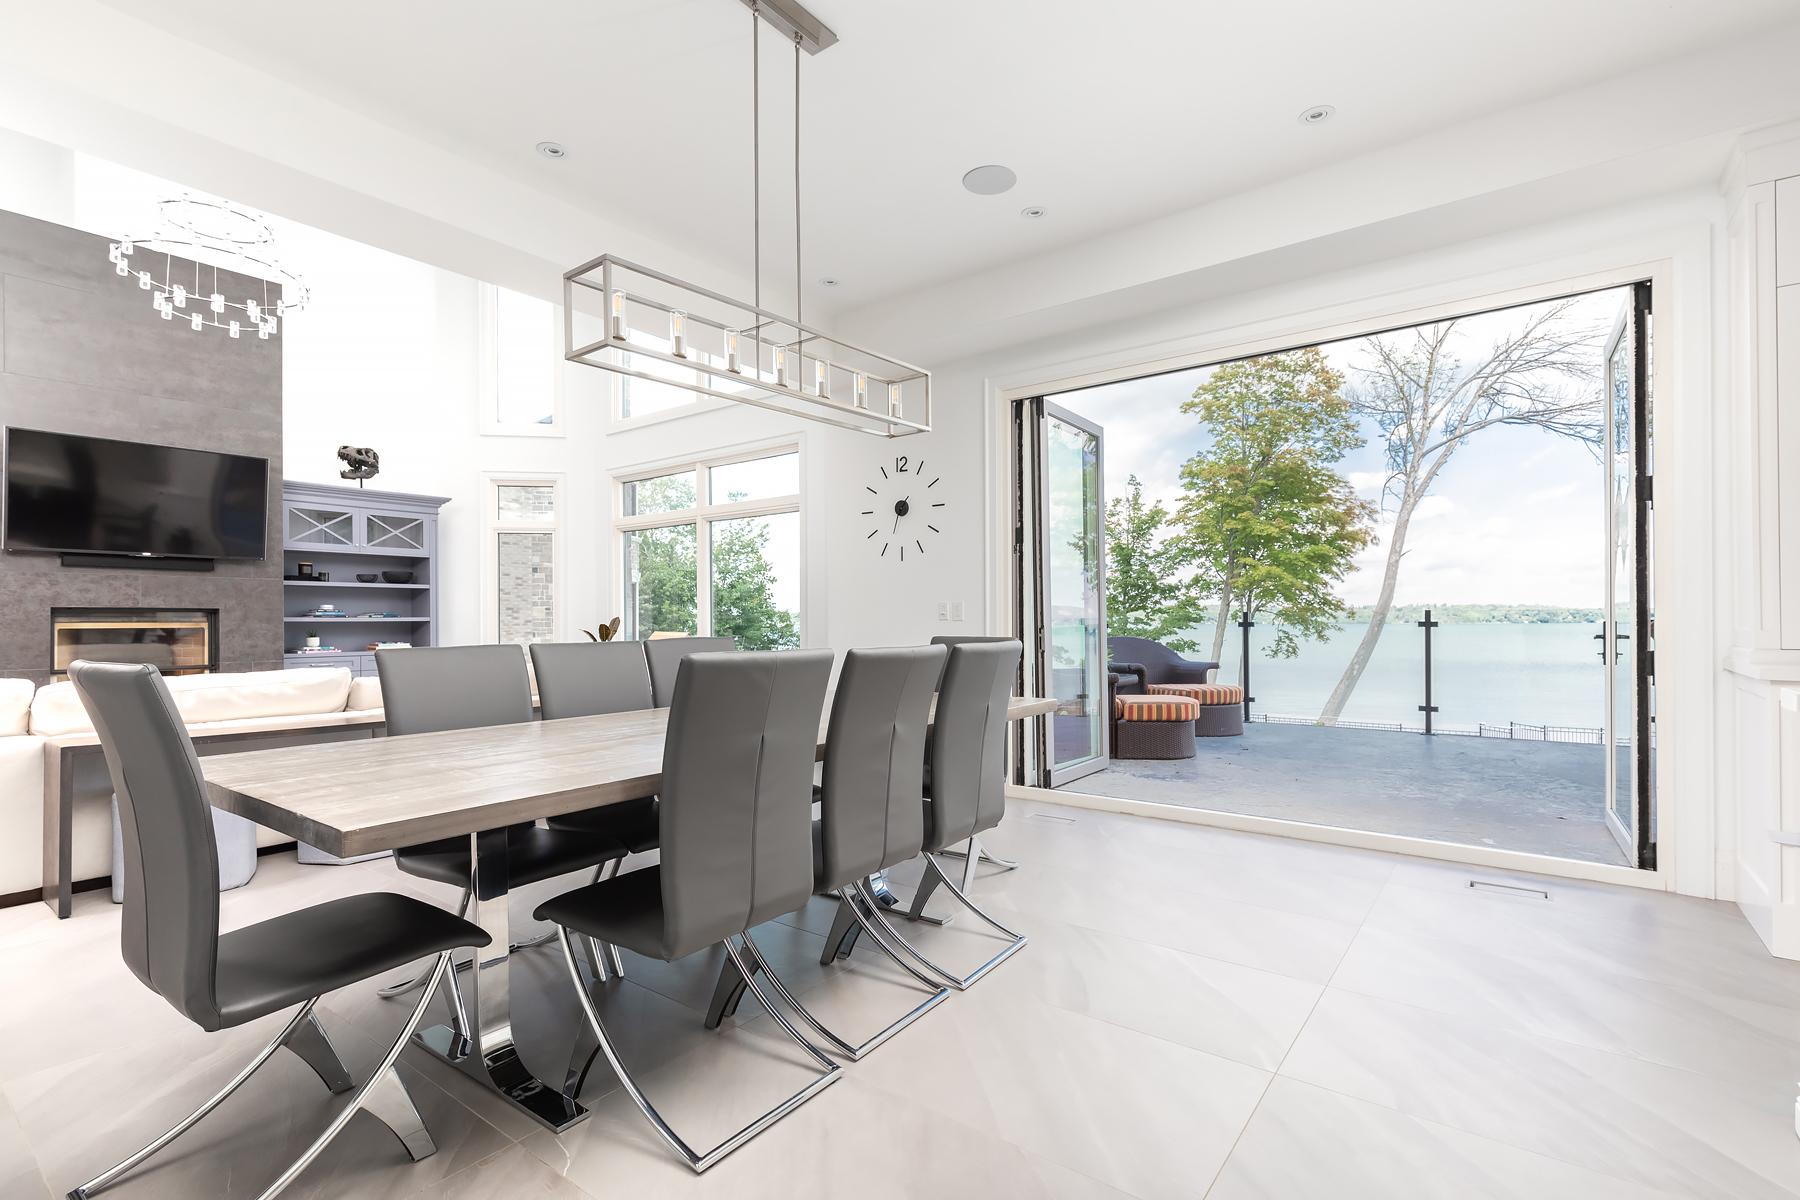 Floor - Paralello Grey | Kitchen-Estatuario E05 | Fireplace - Iron Grey